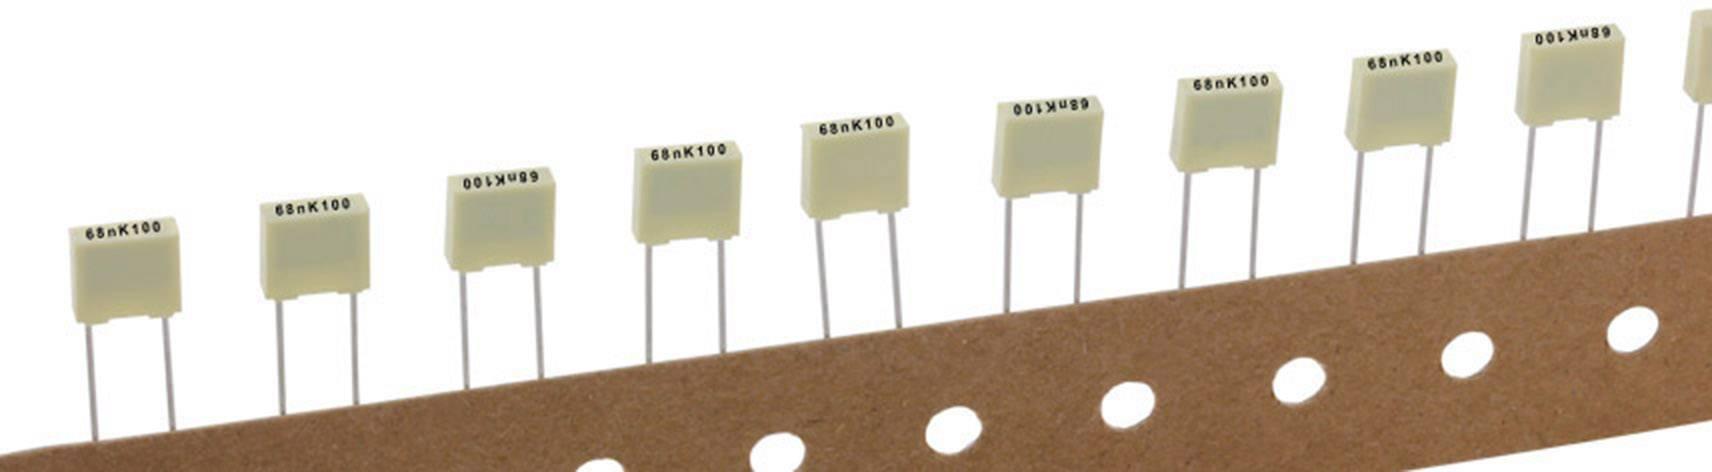 Polyesterový kondenzátor Kemet R82EC2100DQ50K+ radiálne vývody, 10 nF, 100 V,10 %, 5 mm, (d x š x v) 7.2 x 2.5 mm x 6.5 mm, 1 ks